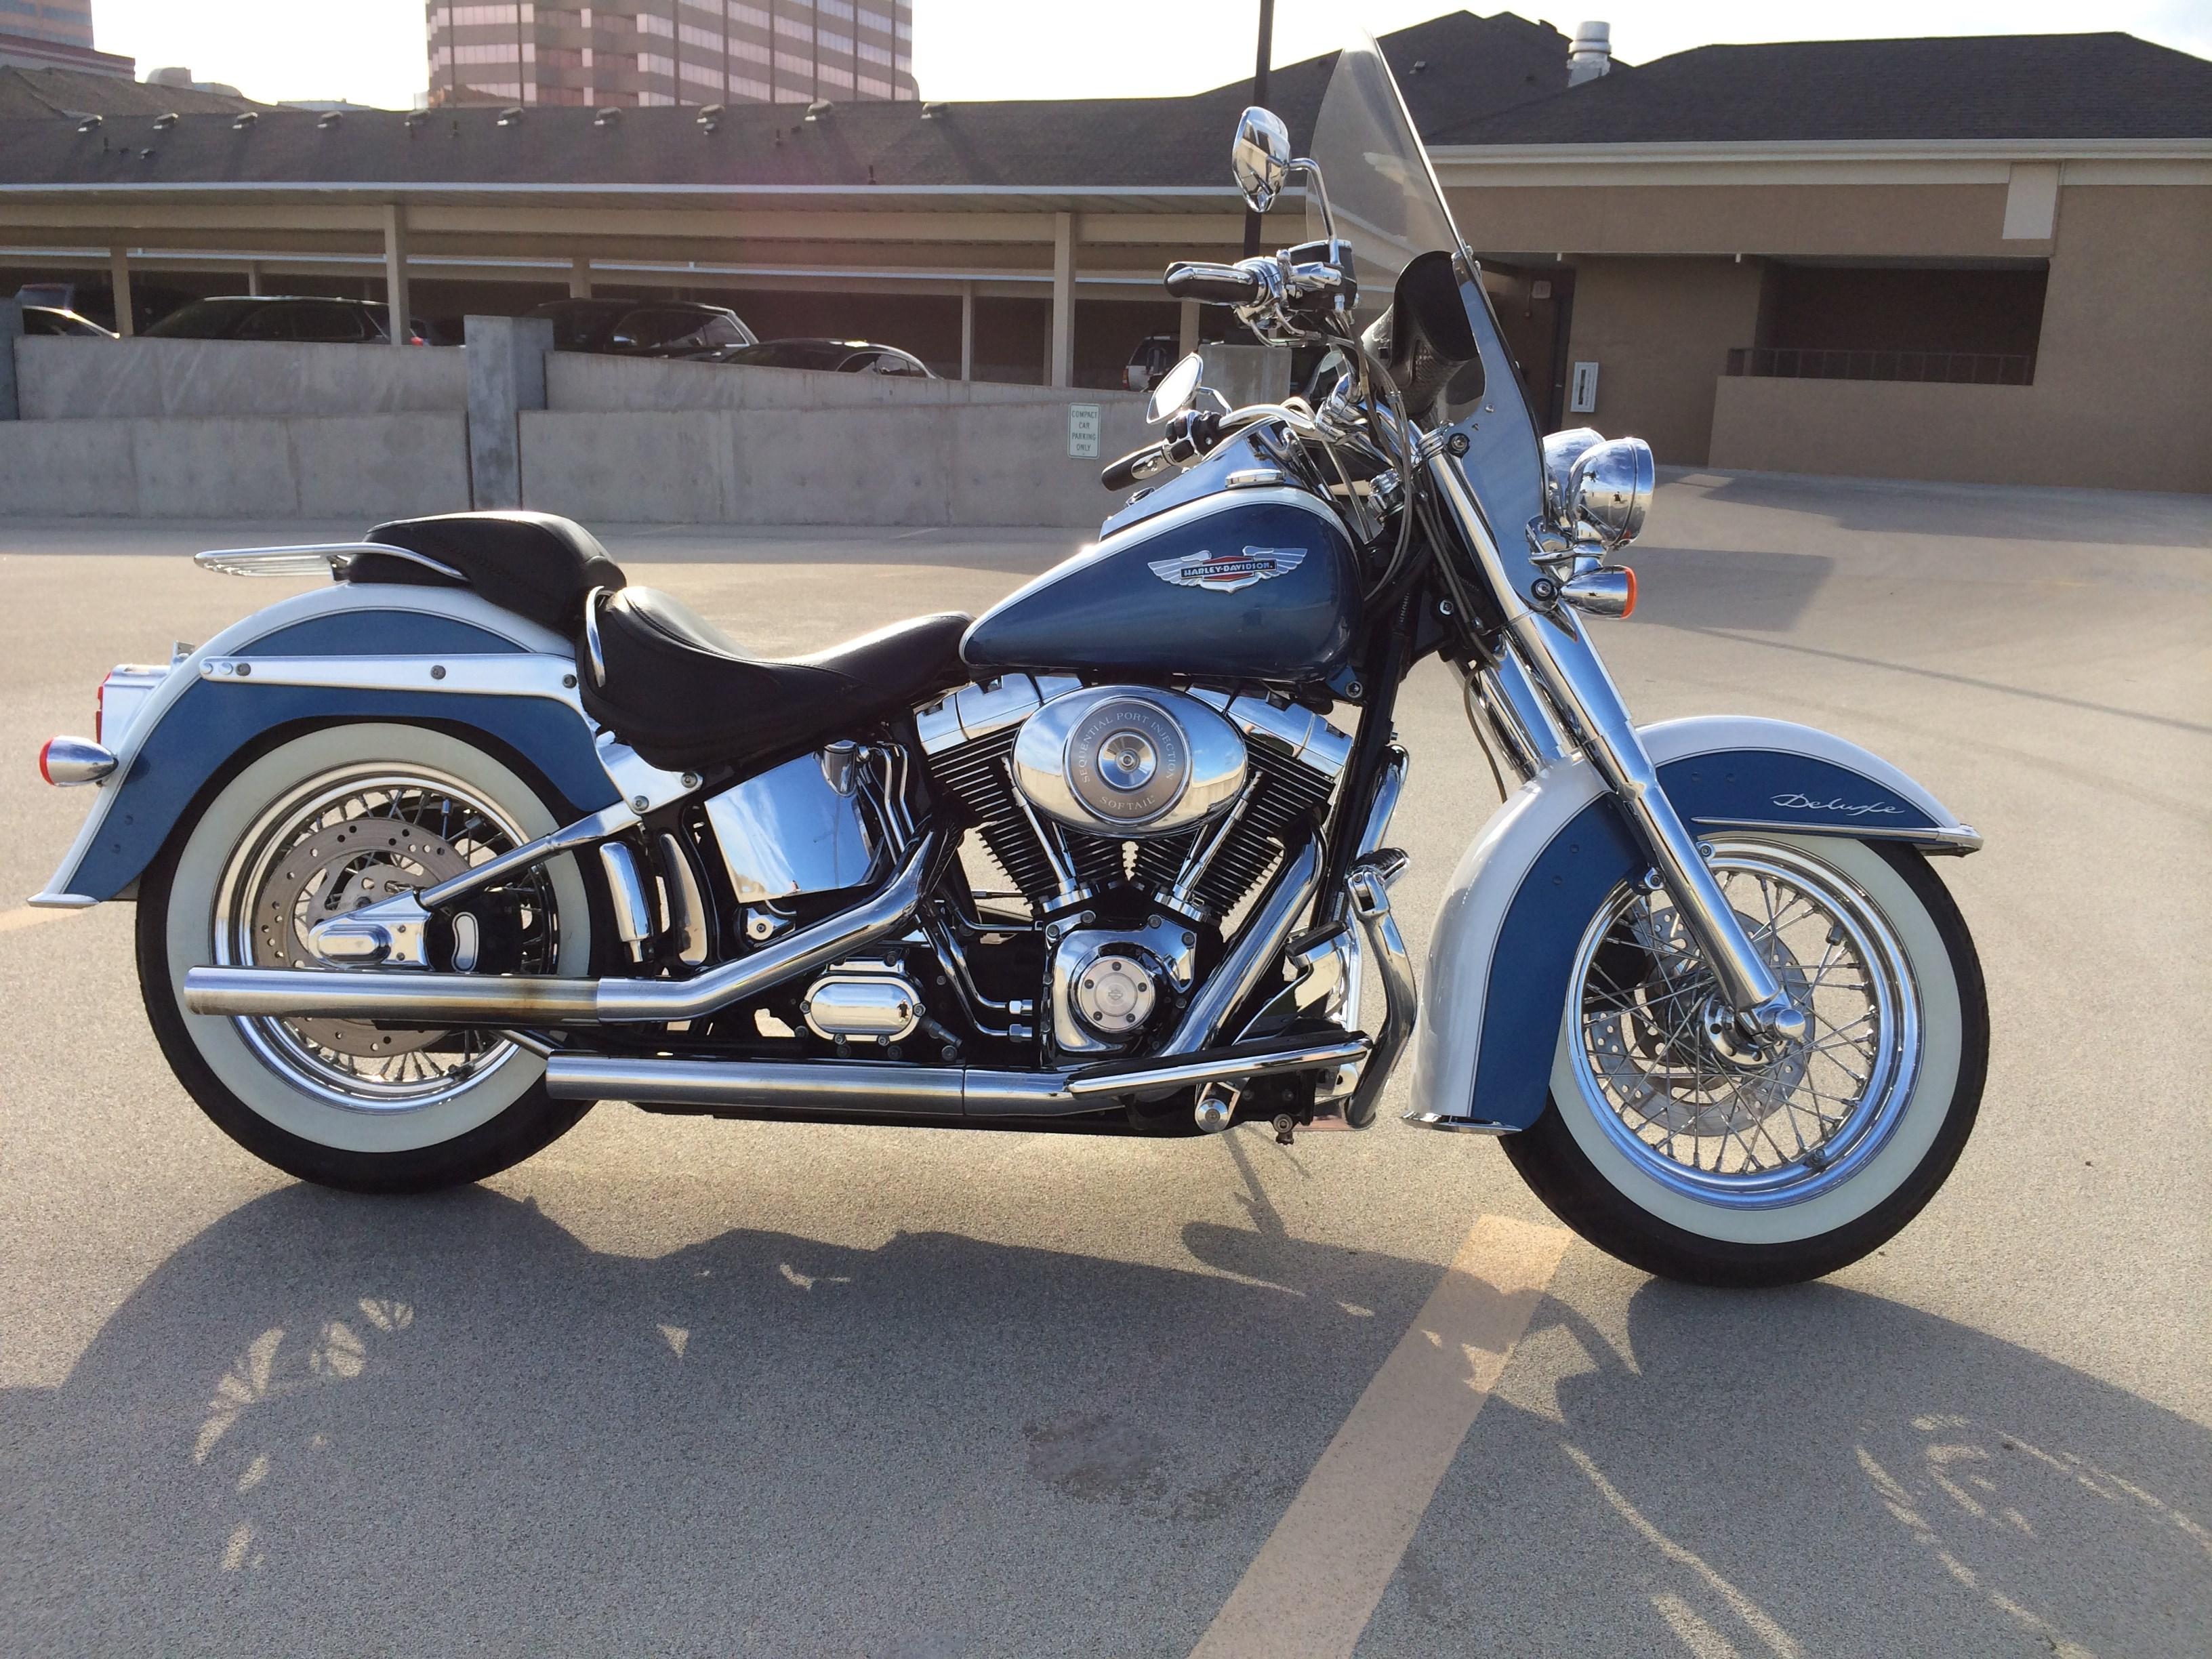 Dallas Harley Davidson >> 2005 Harley-Davidson® FLSTN/I Softail® Deluxe (Blue Pearl And White Glacier), Dallas, Texas ...